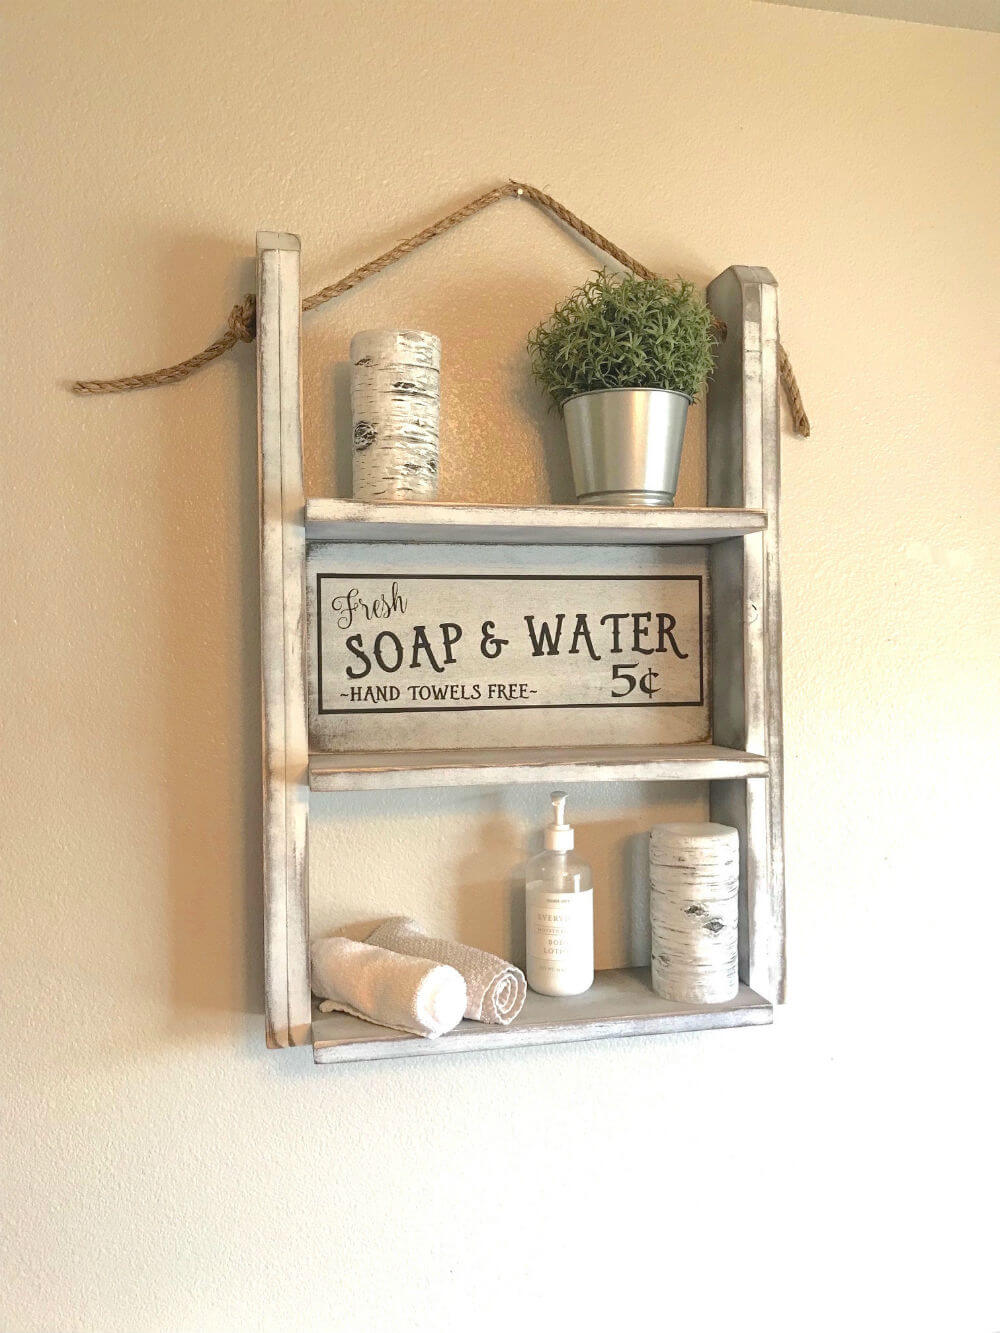 Red roan signs farmhouse bathroom shelf https://homebnc.com/best-etsy-bathroom-accessories-ideas-to-buy/